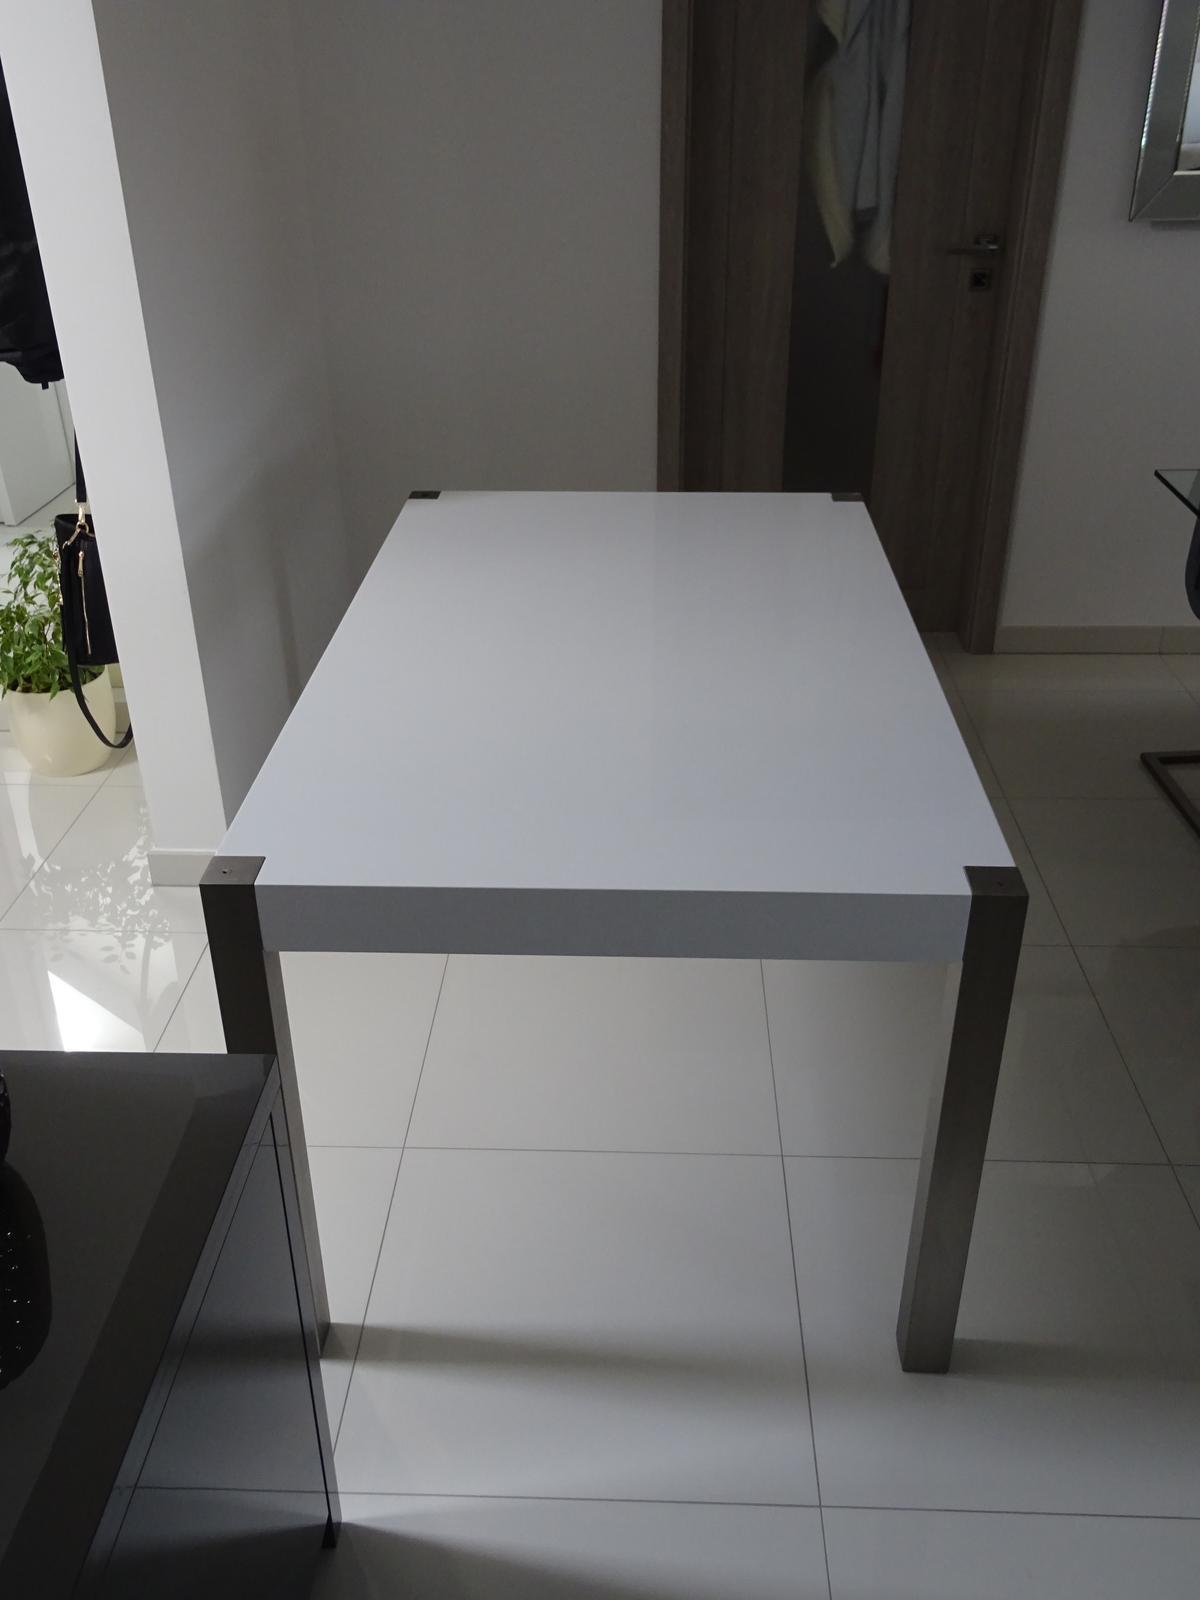 39d0204bf510 Jedalenský stôl biely leskly